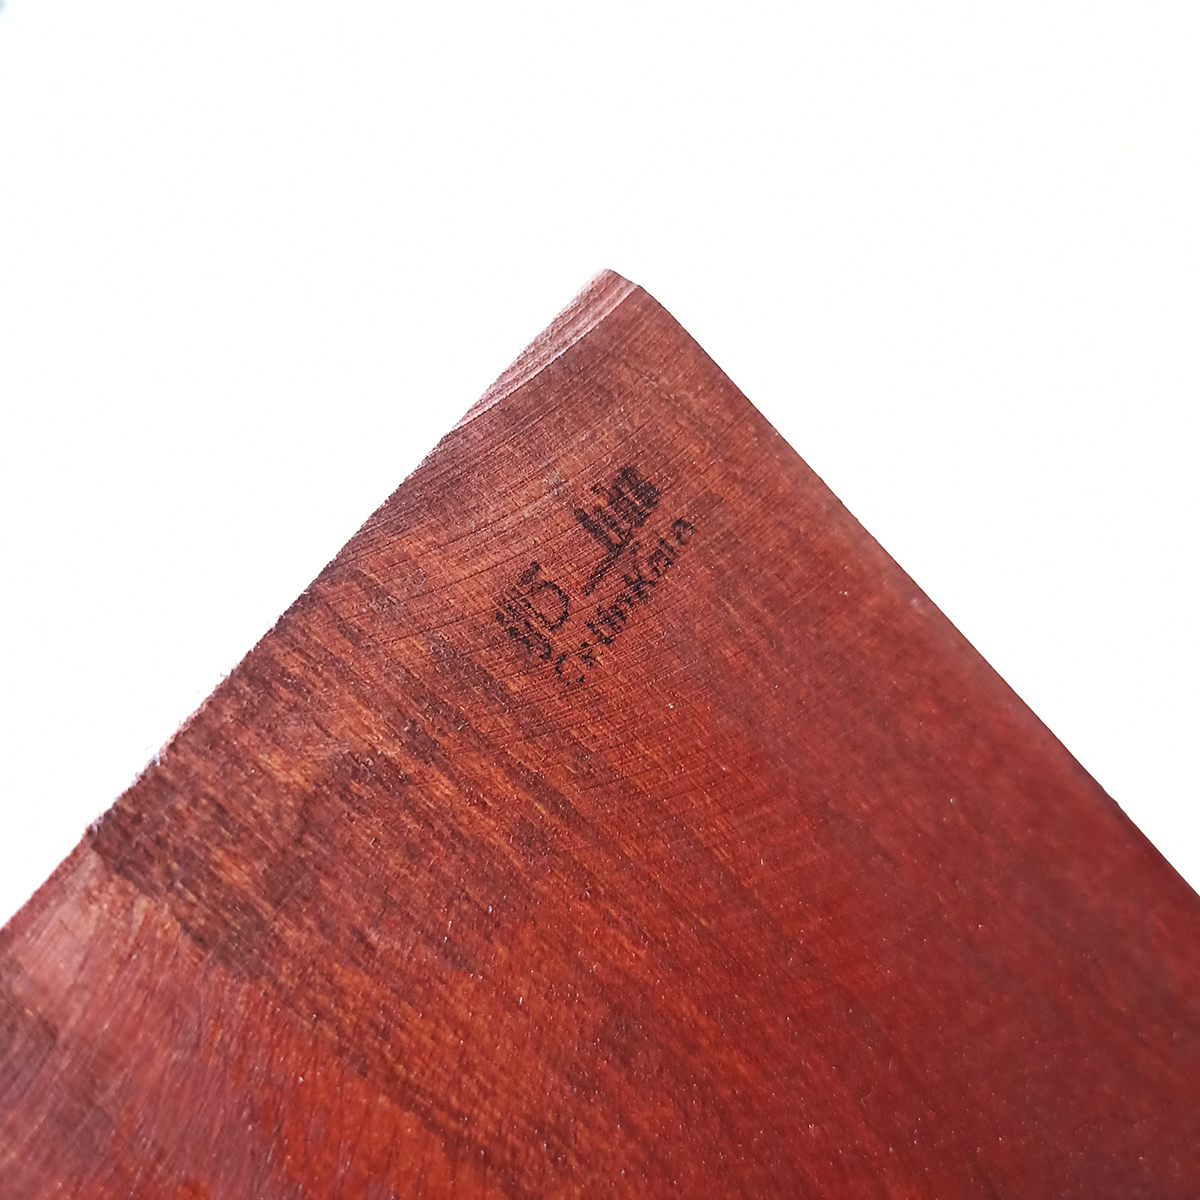 رحل قرآن سلین کالا مدل چوبی ce-As1